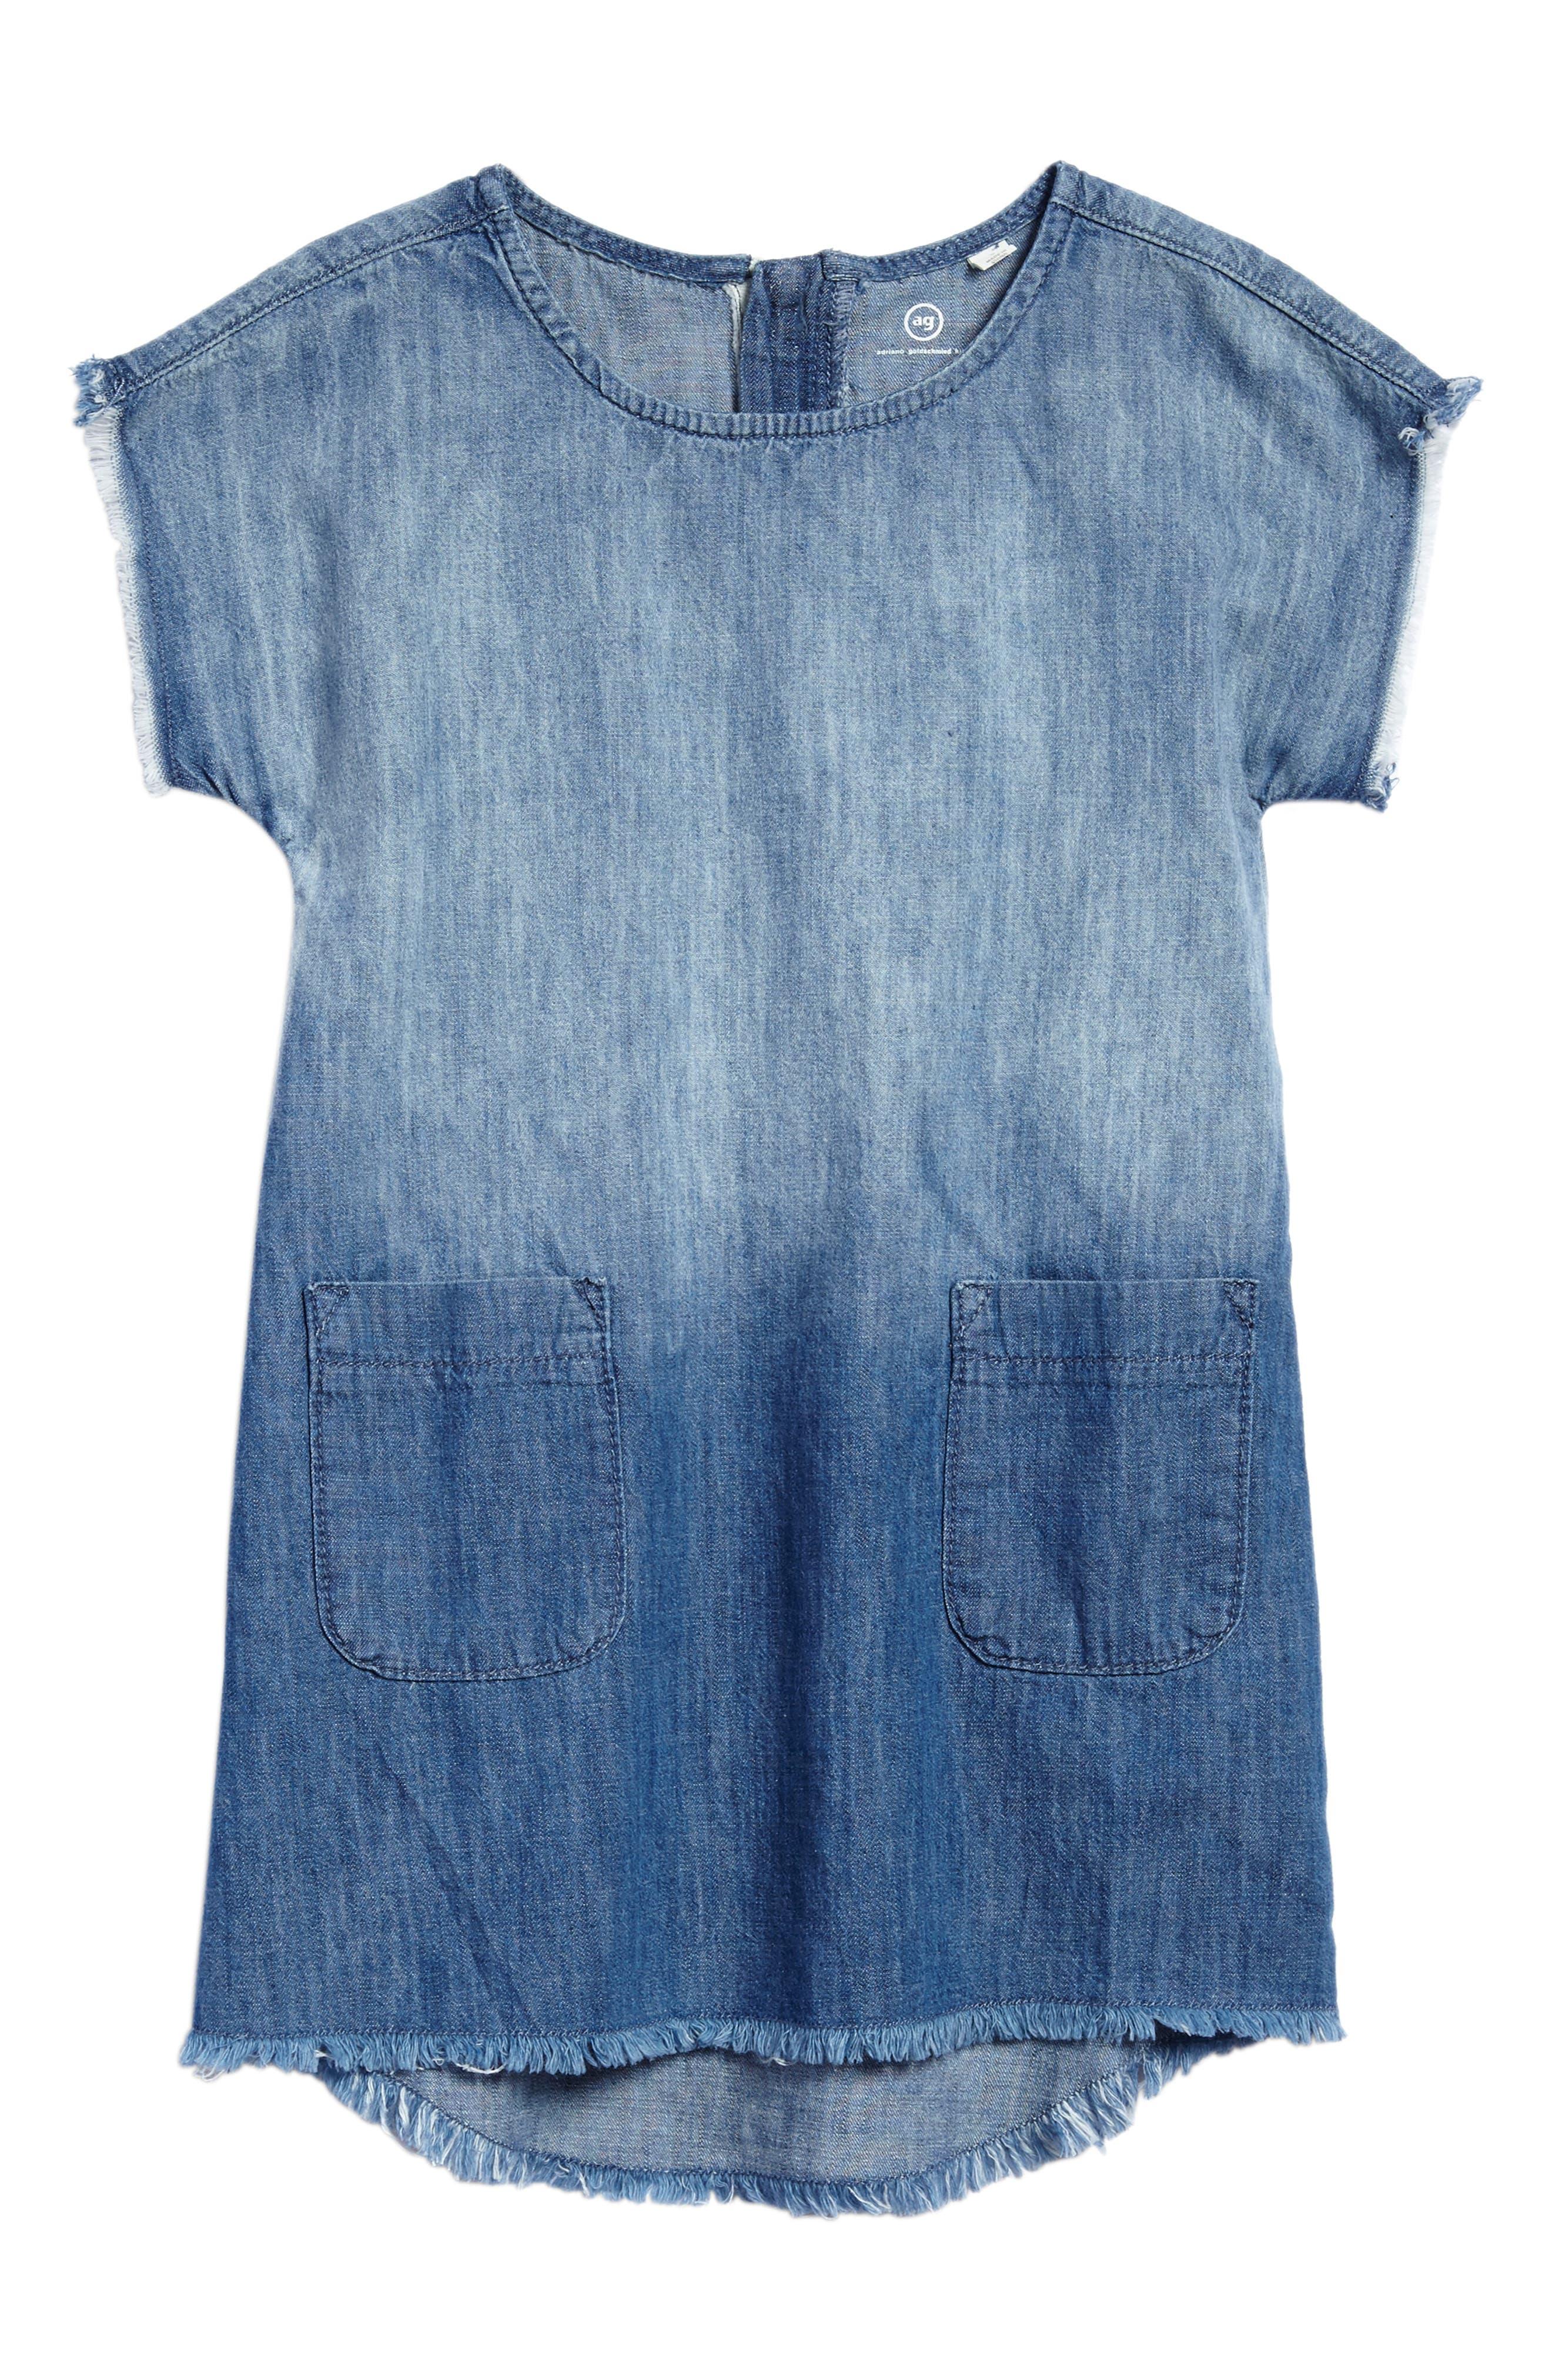 Alternate Image 1 Selected - ag adriano goldschmied kids Dip Dye Dress (Toddler Girls & Little Girls)